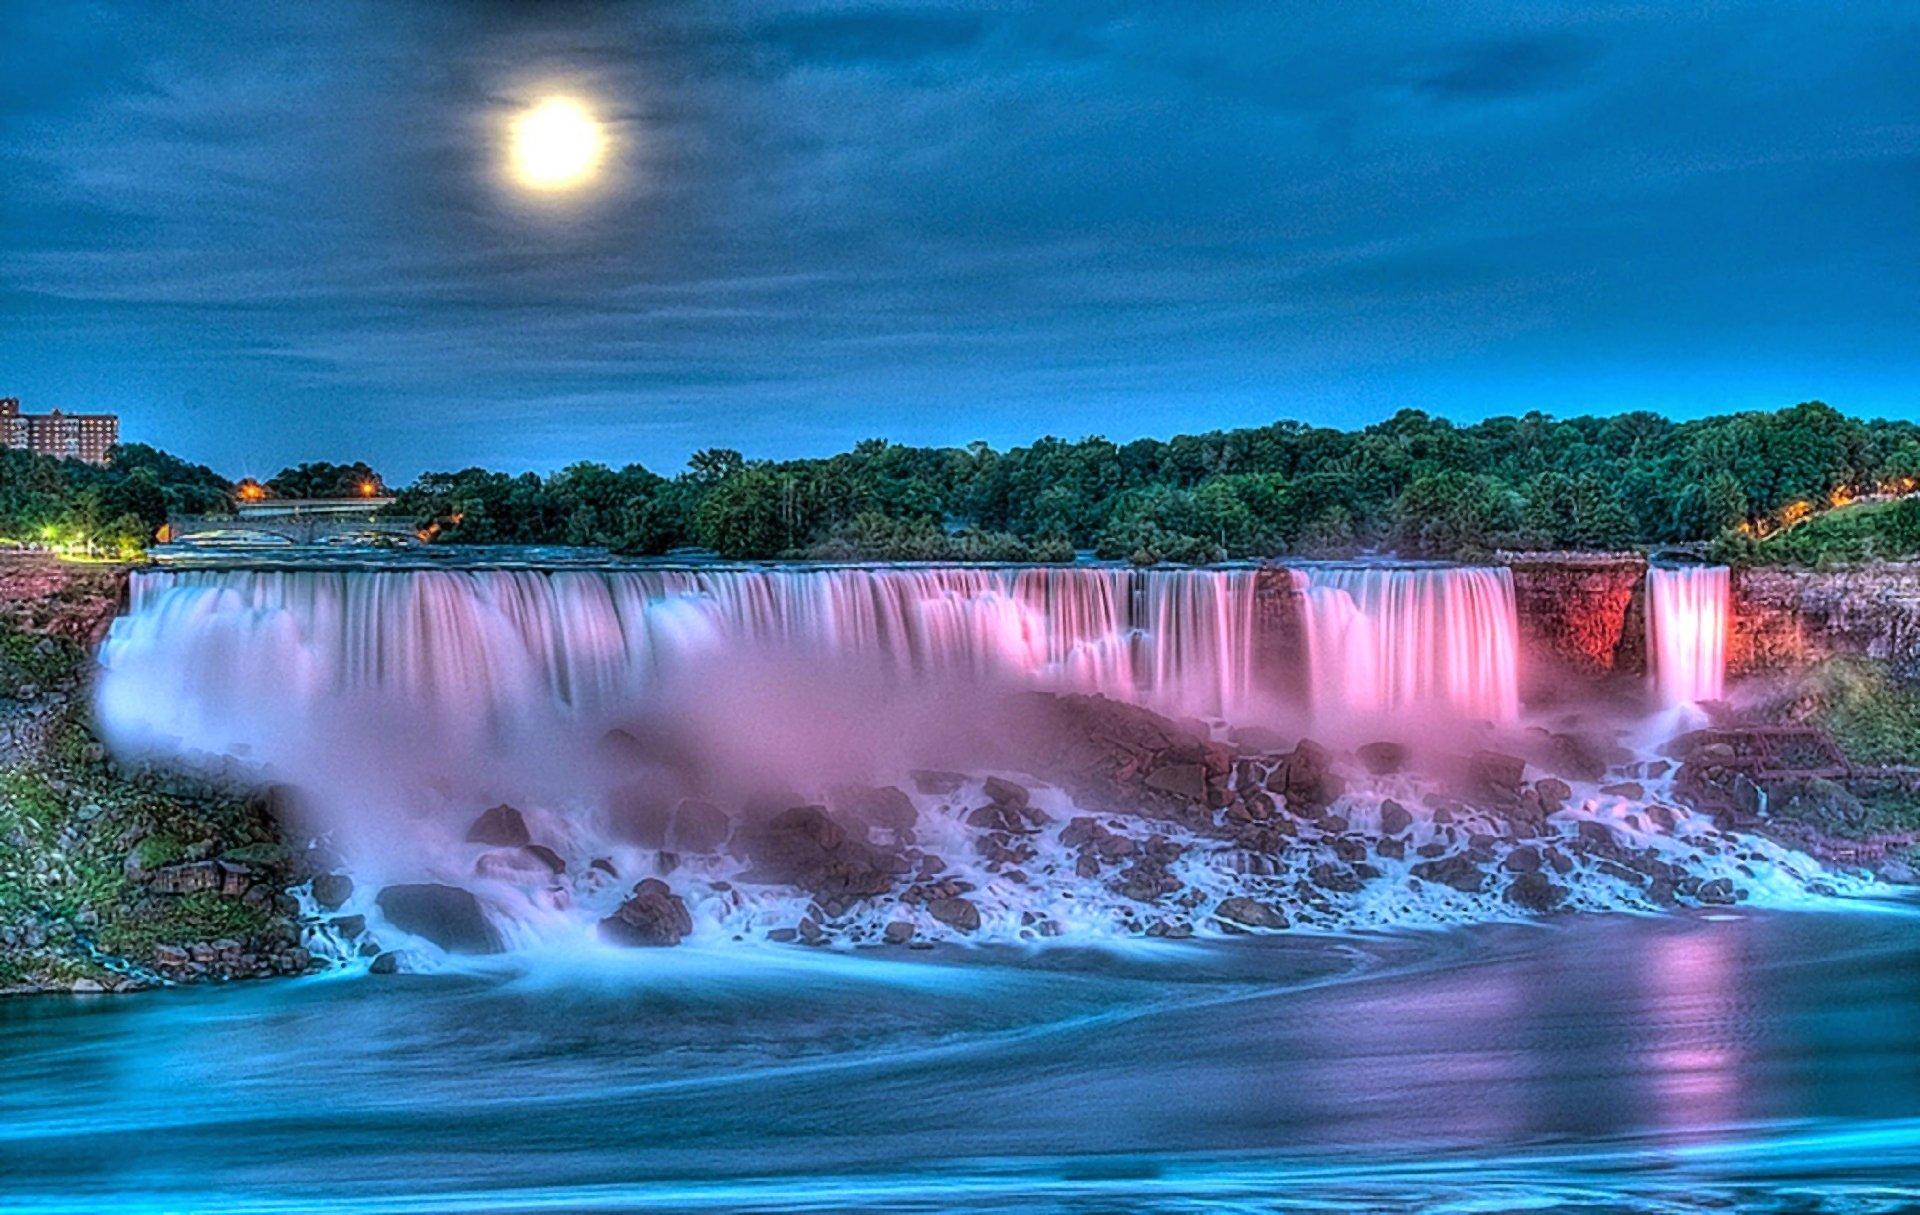 Niagara Falls Full Hd Wallpaper Waterfall On Full Moon Night Hd Wallpaper Background